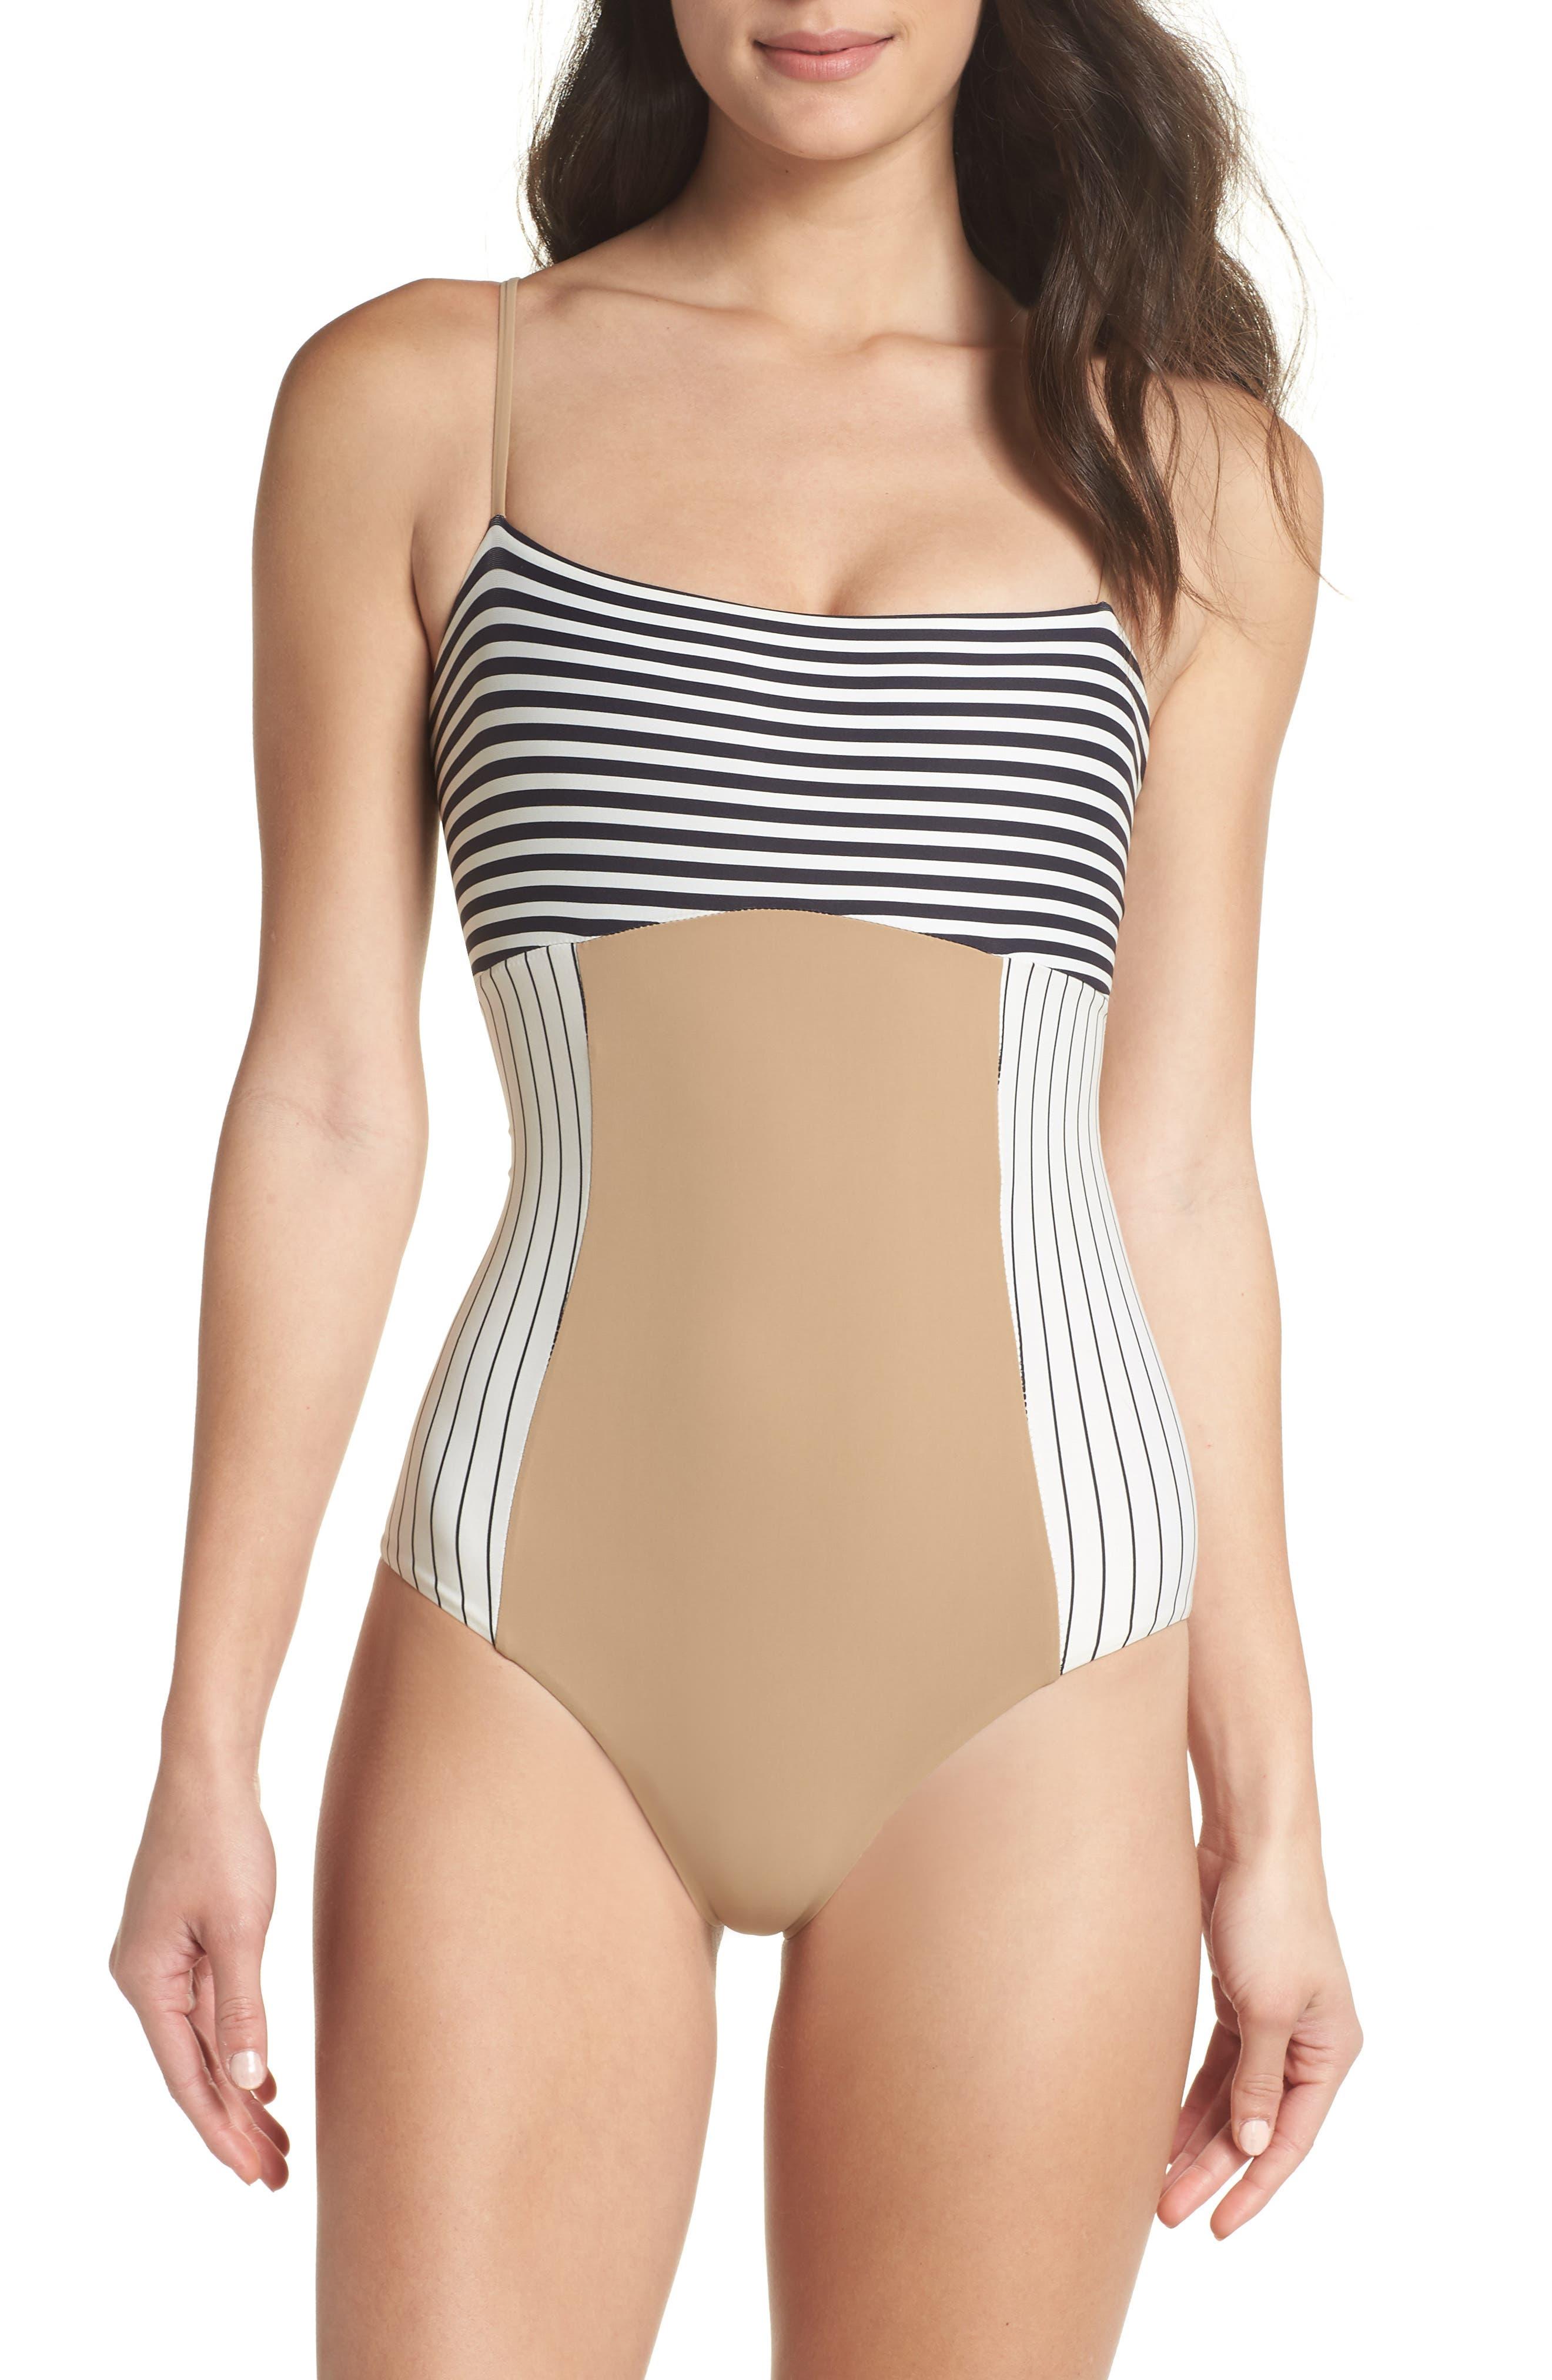 Finn One-Piece Swimsuit,                             Main thumbnail 1, color,                             250